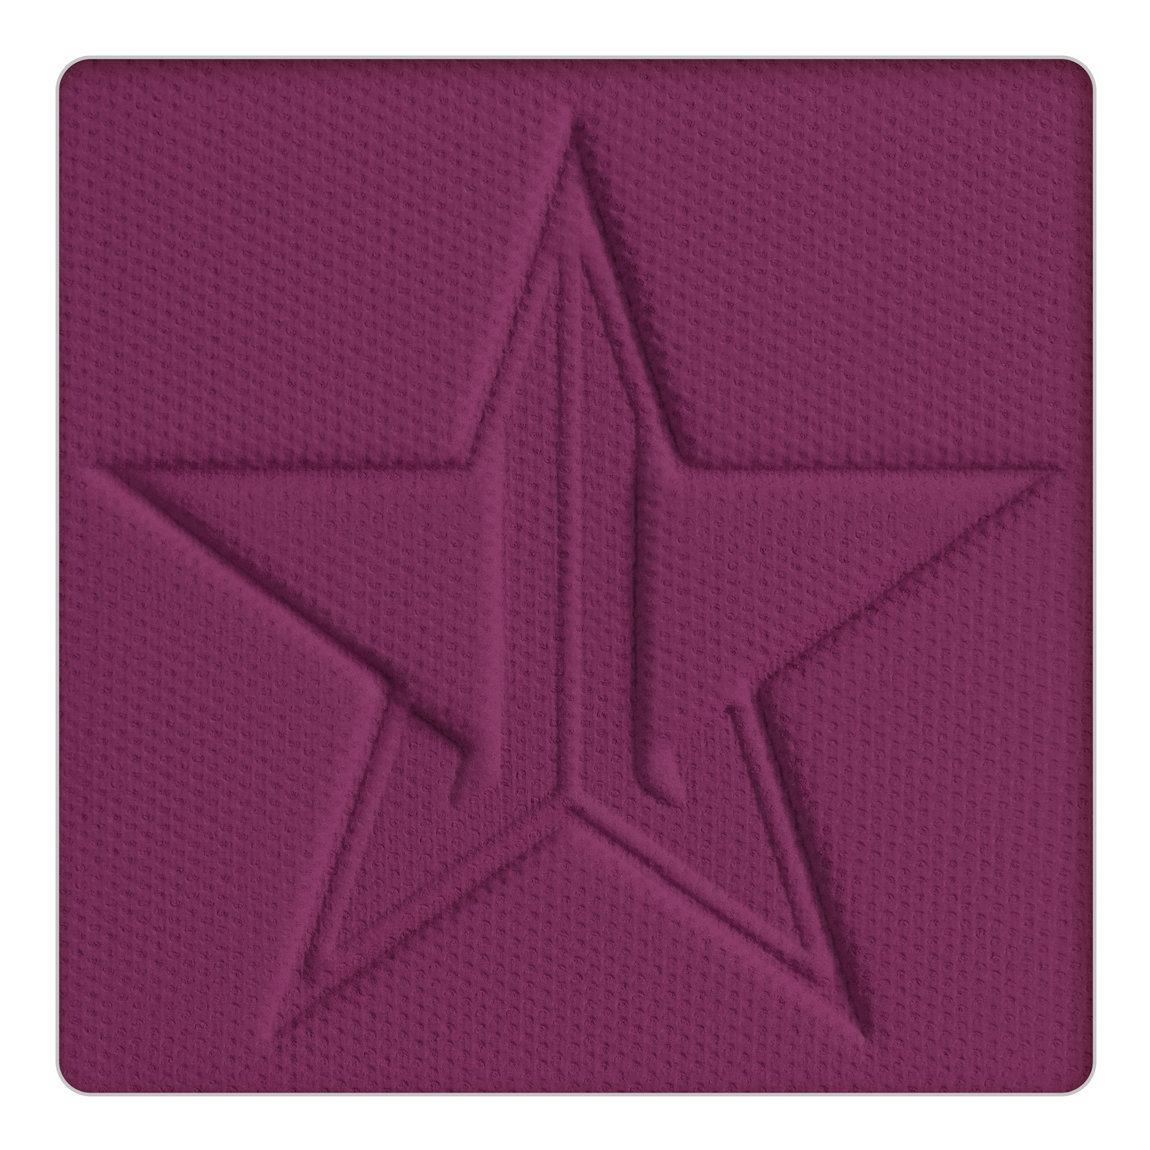 Jeffree Star Cosmetics Artistry Singles Coma alternative view 1.